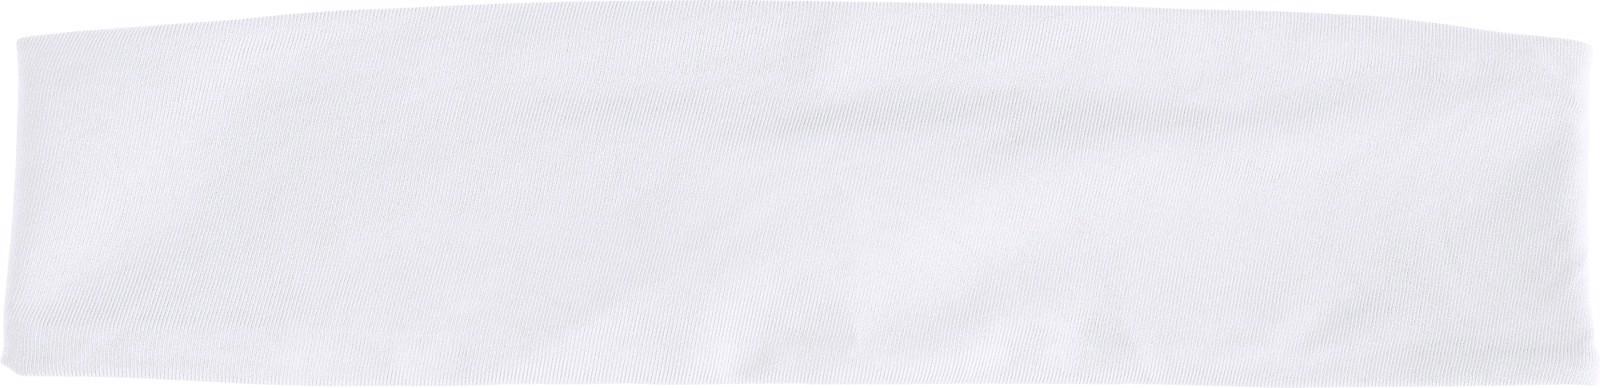 Polyester headband - White